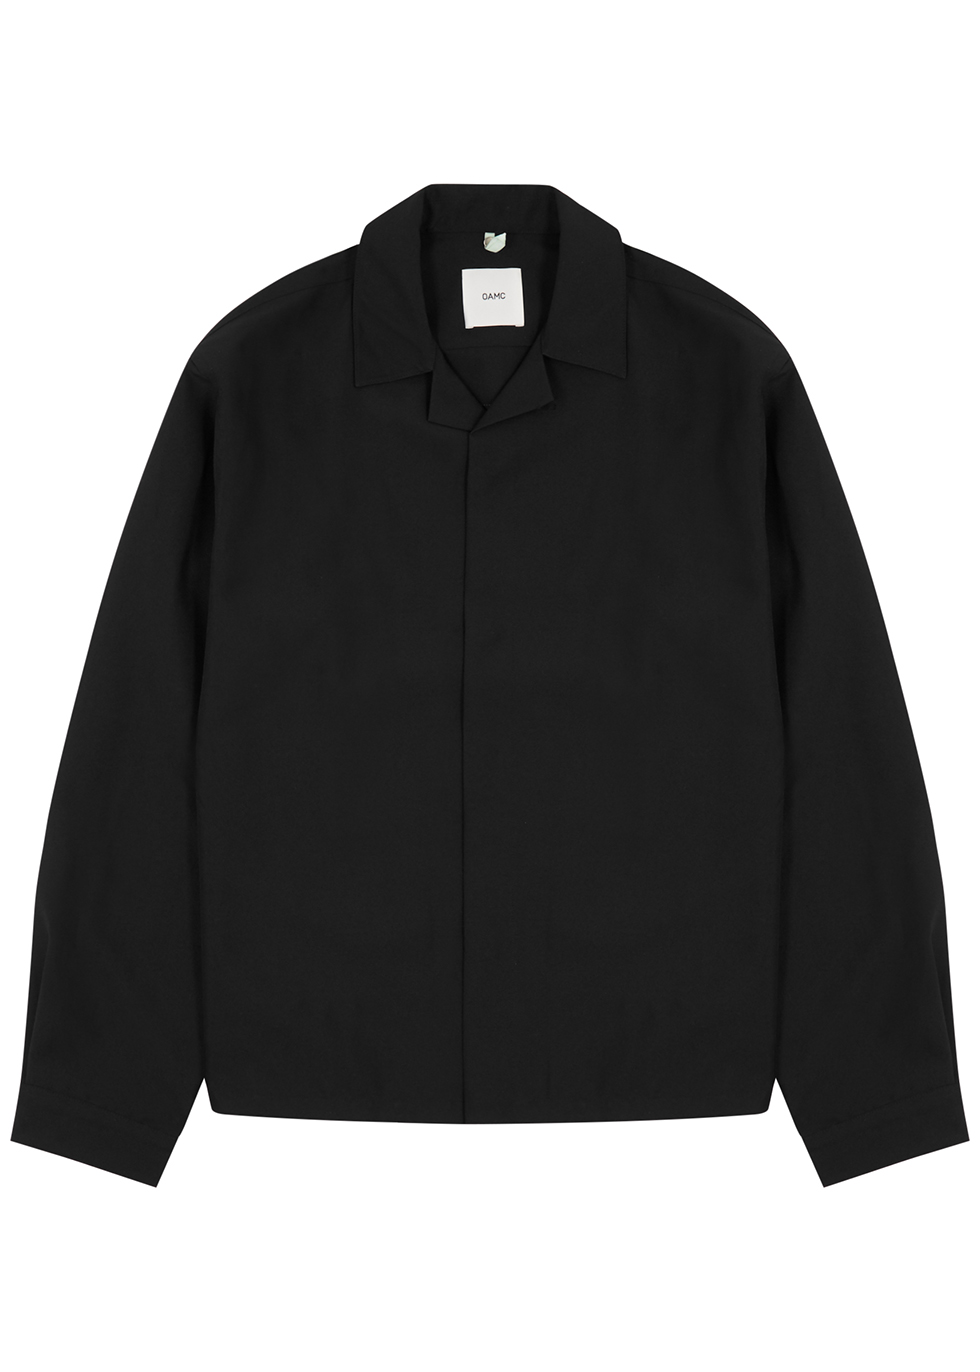 System black printed overshirt